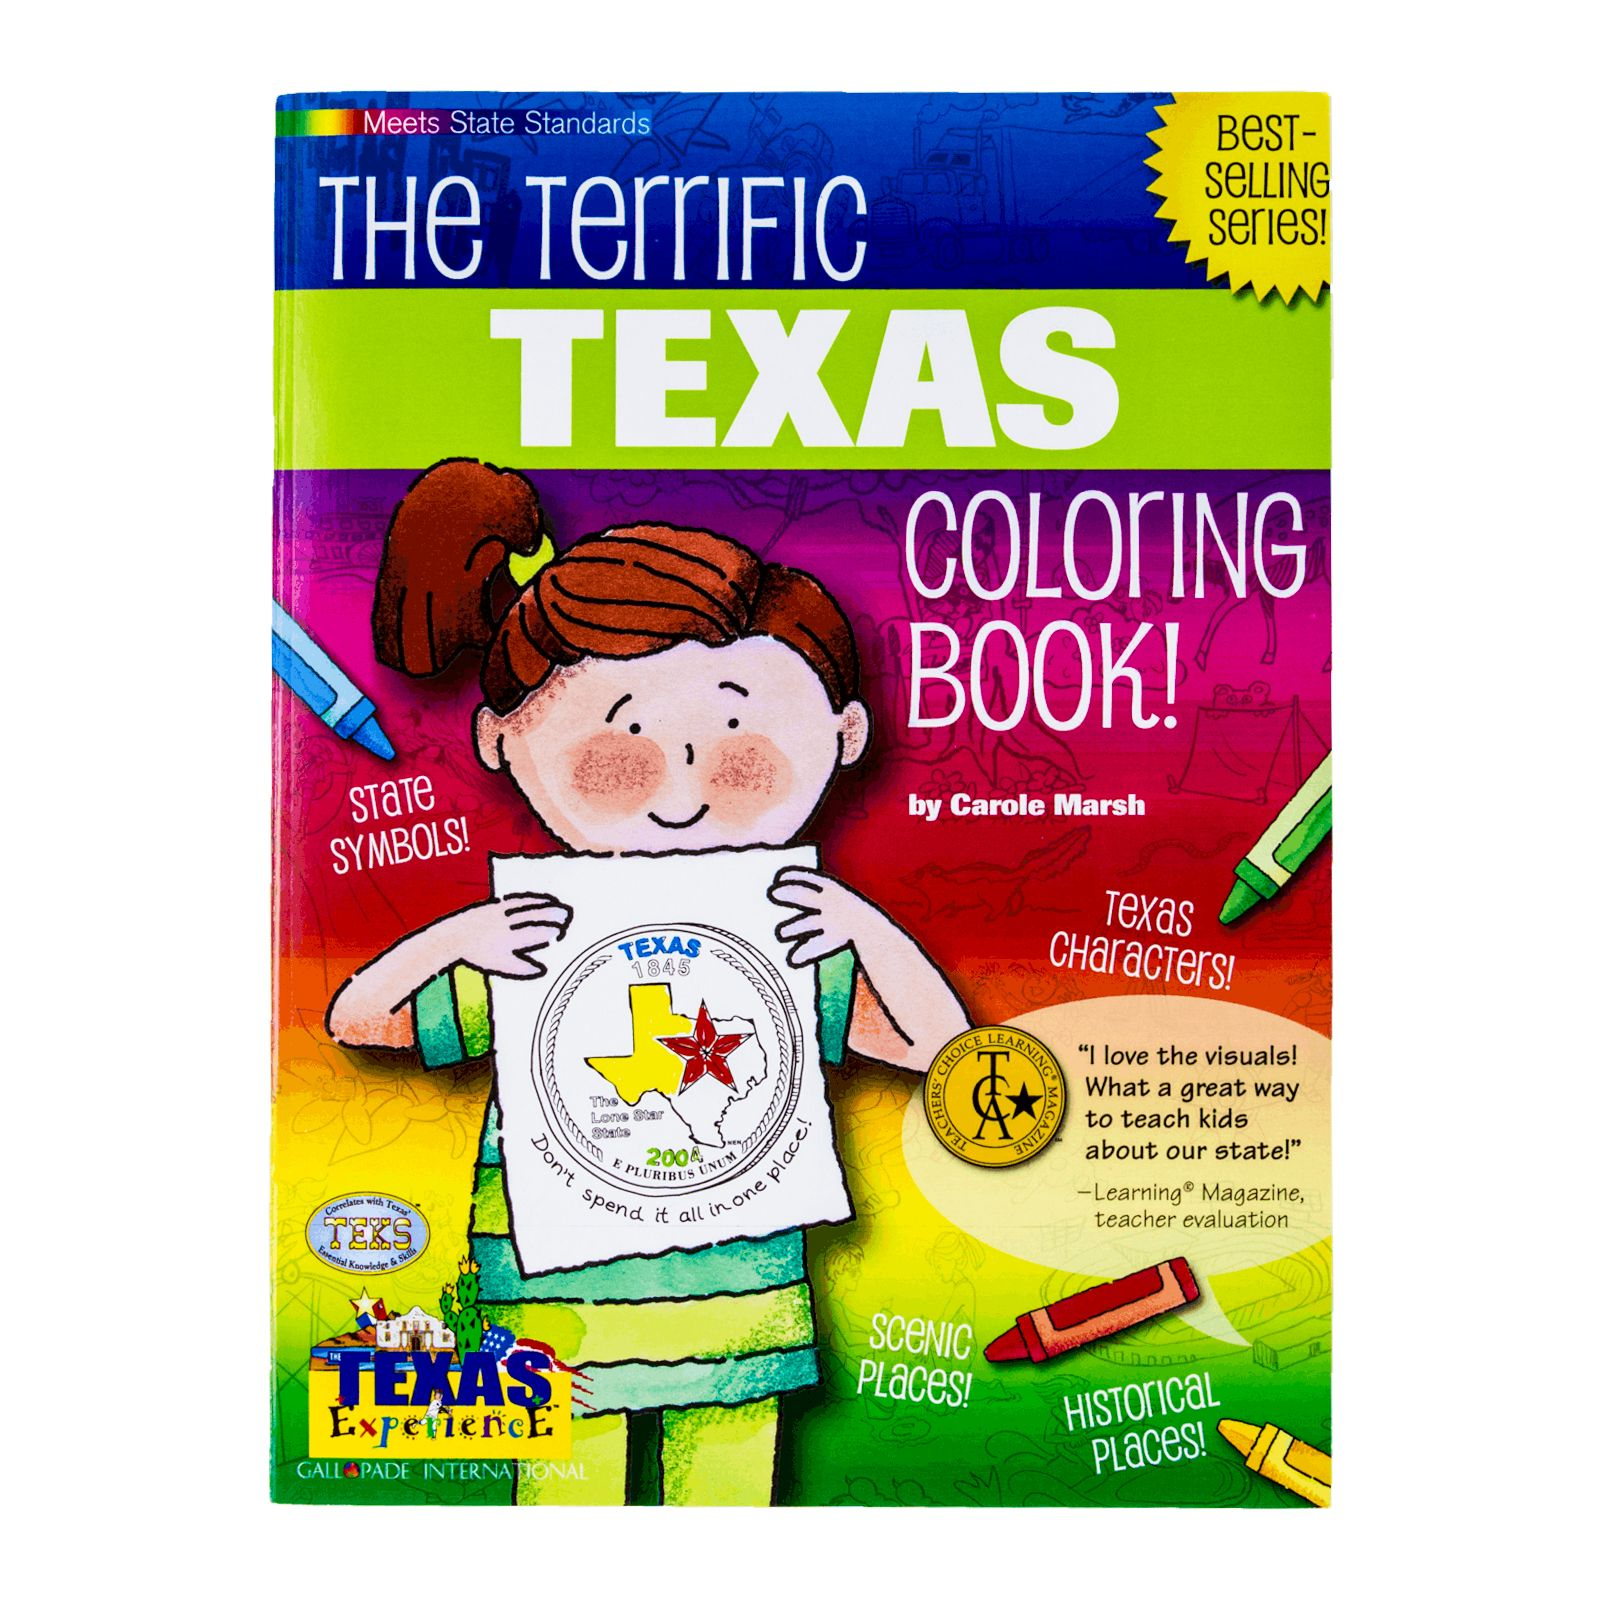 The Terrific Texas Coloring Book